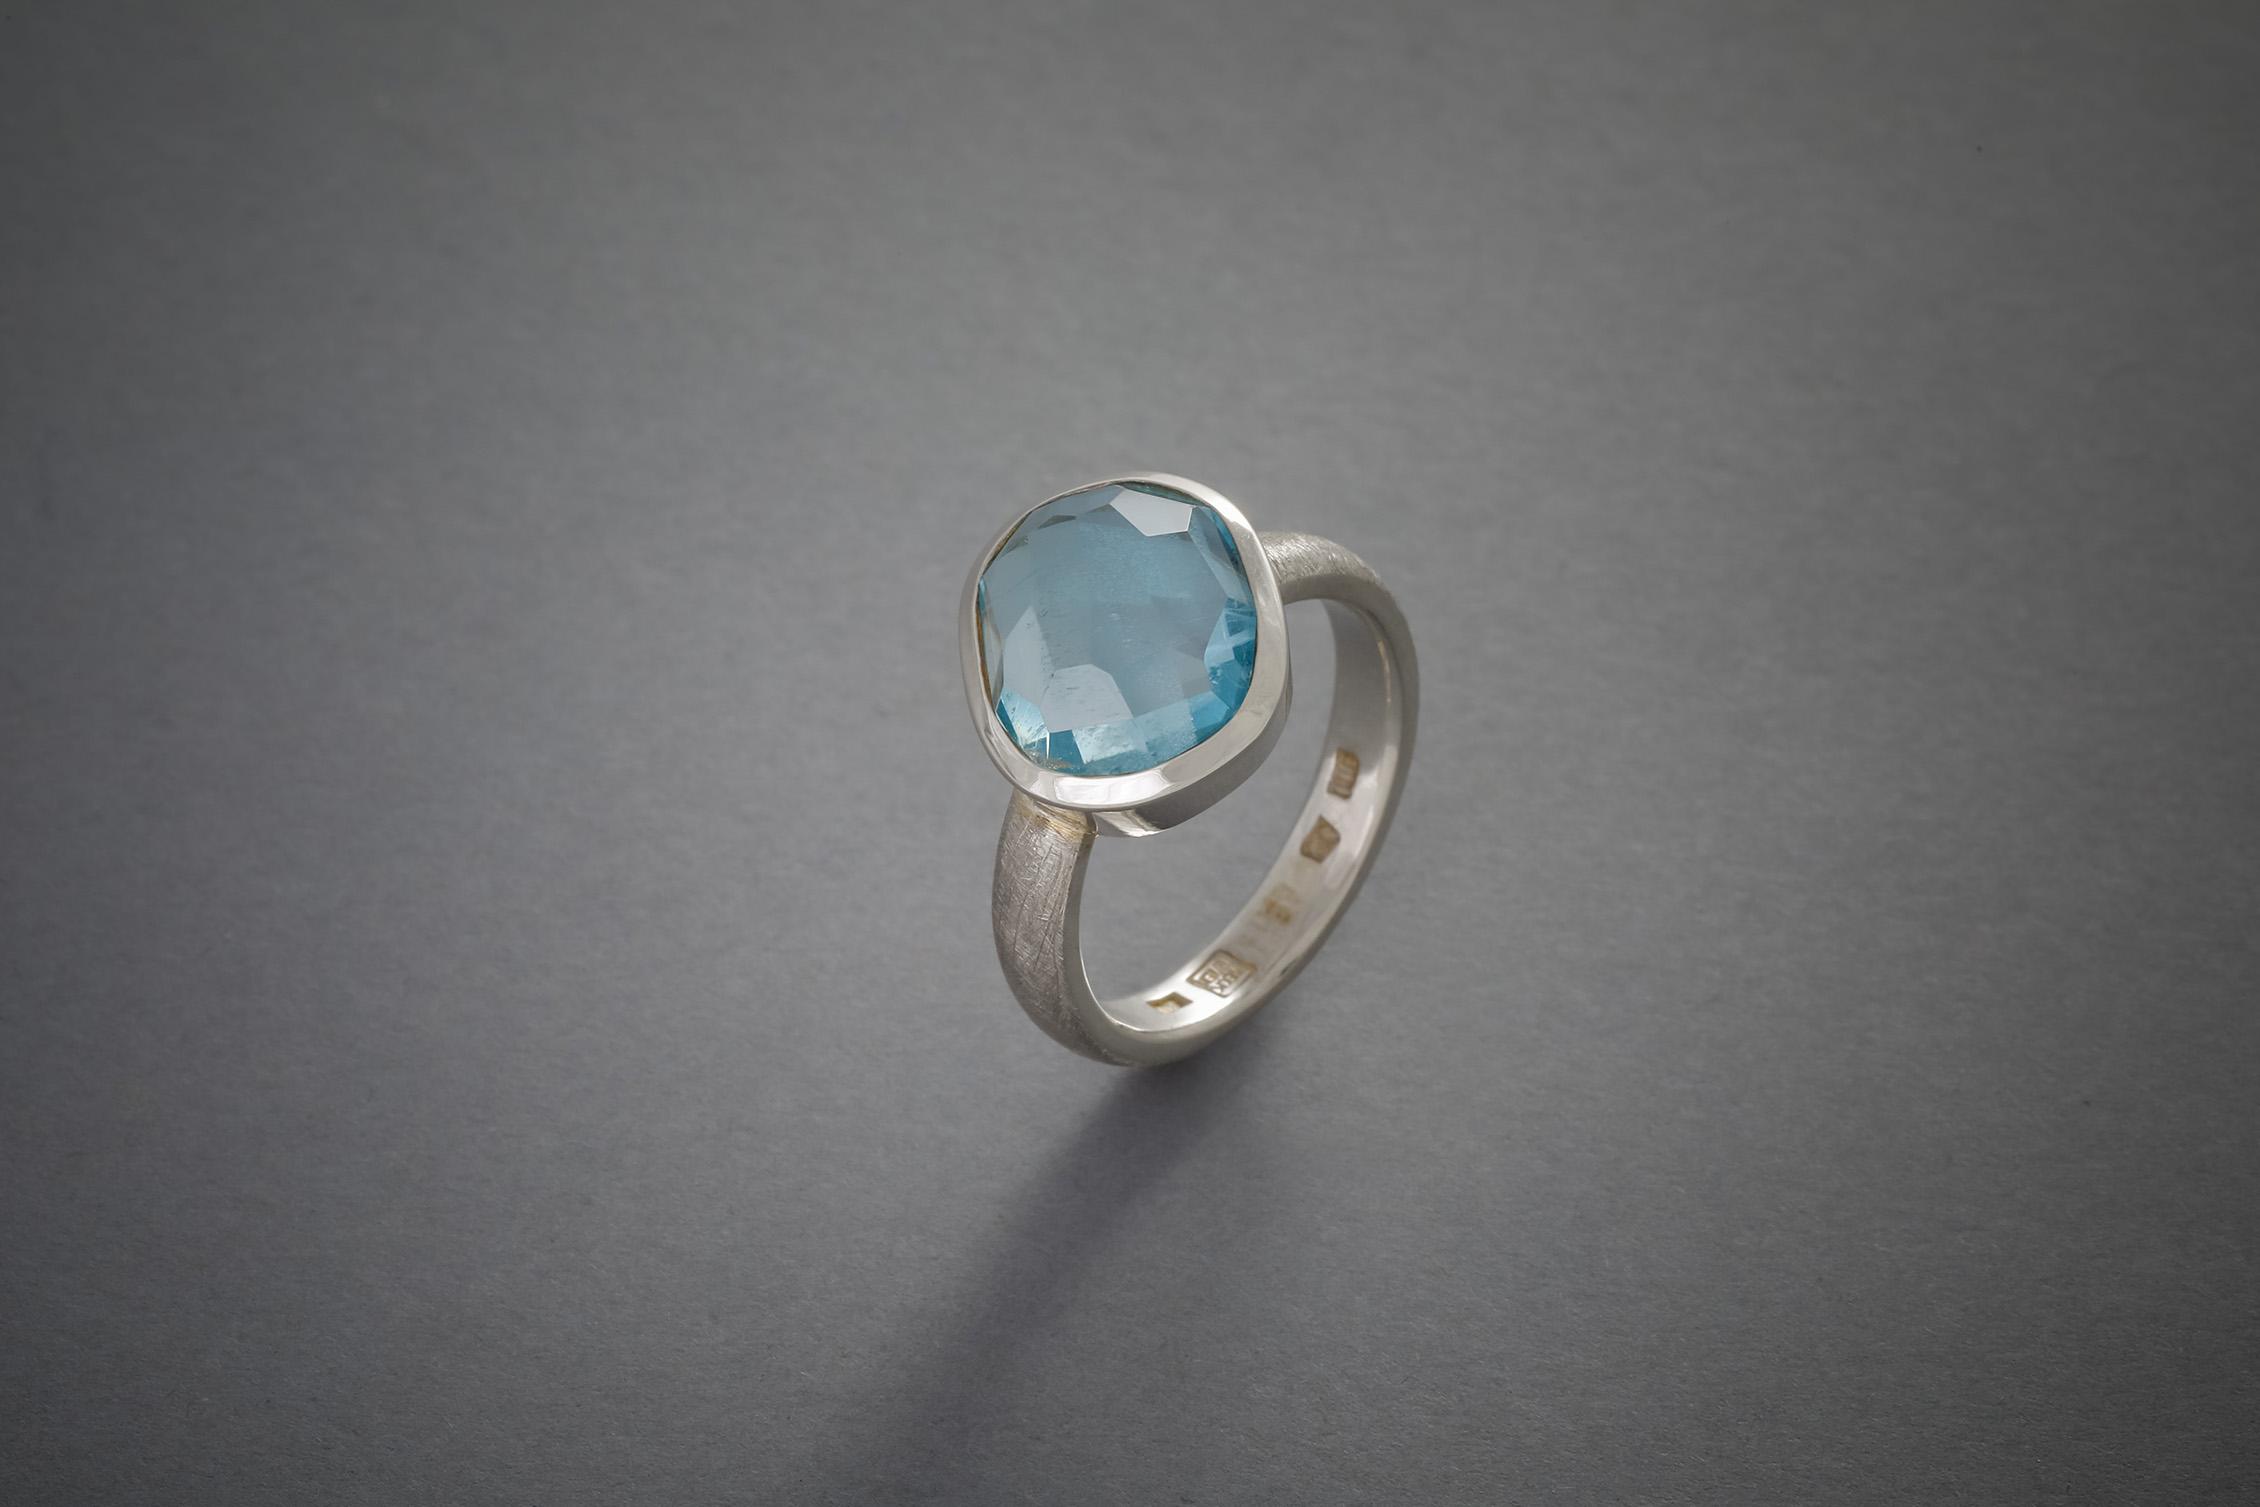 013 Silberring Aquamarin, Antikschliff, ab € 598,-